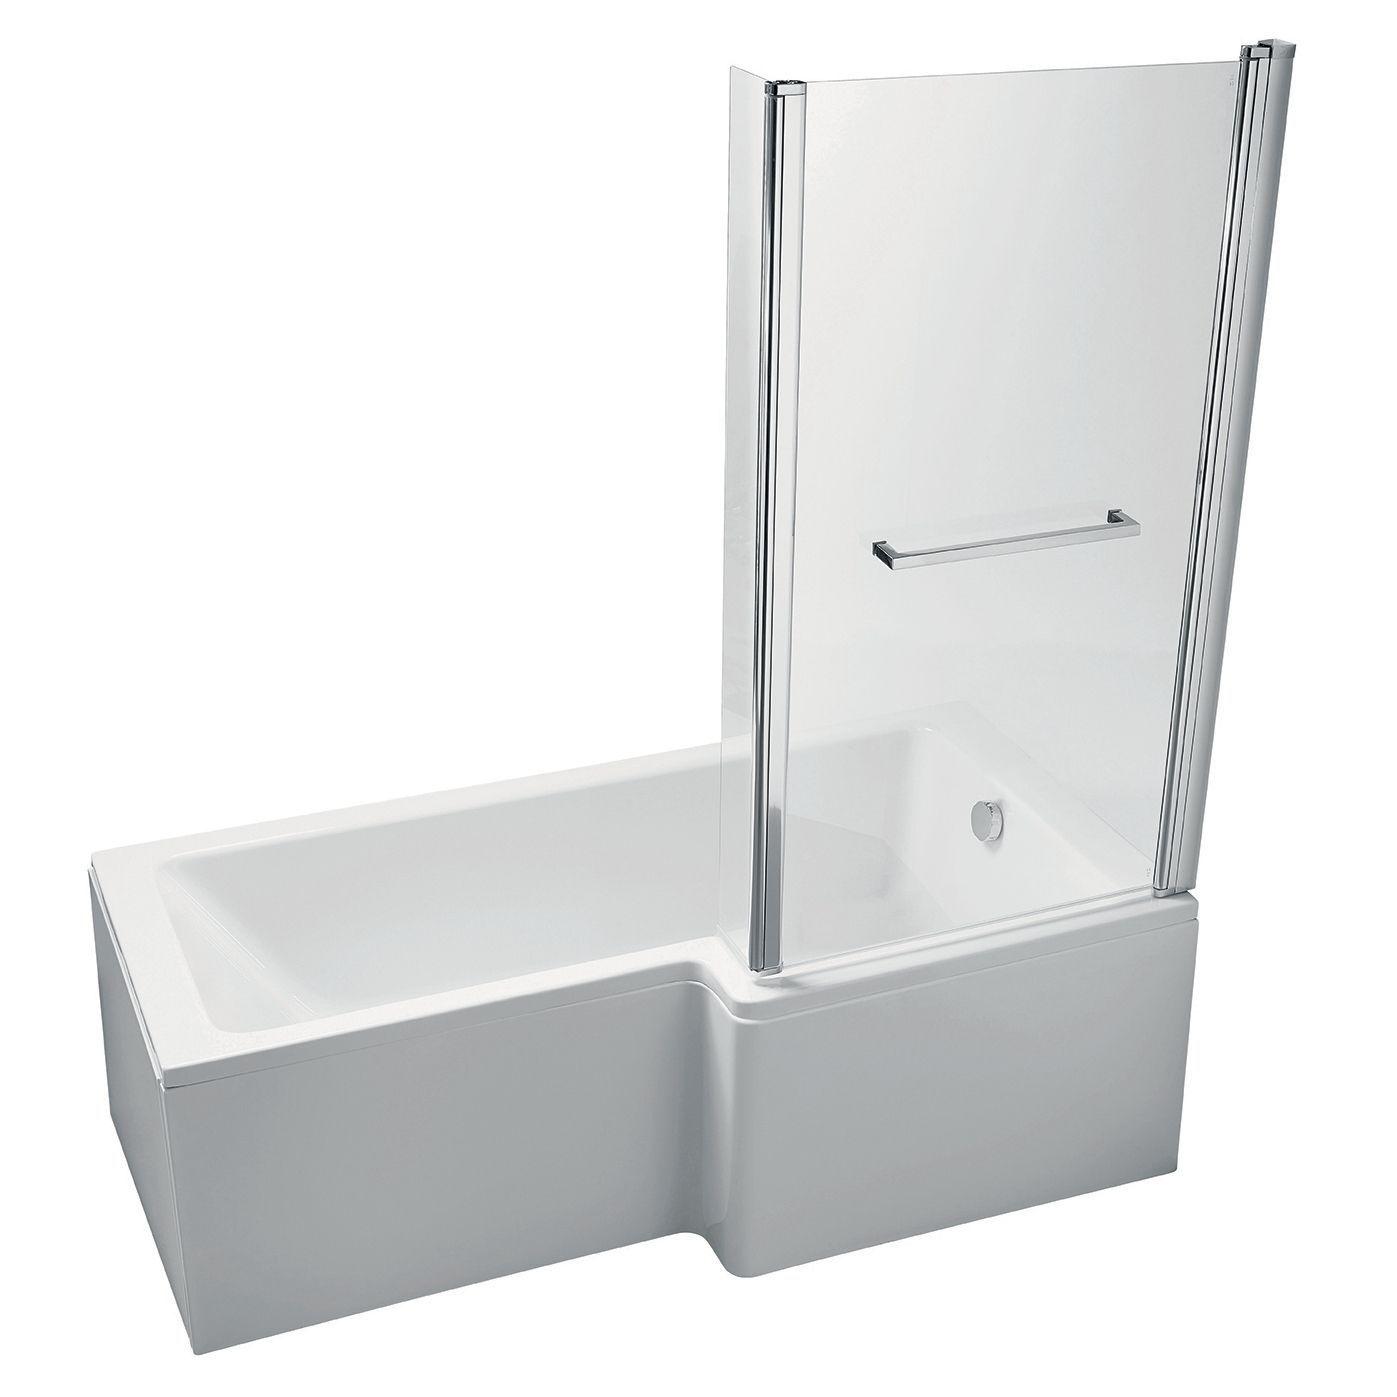 ideal standard bathroom fixture diy ideal standard imagine rh acrylic rectangular shower bath front panel screen l